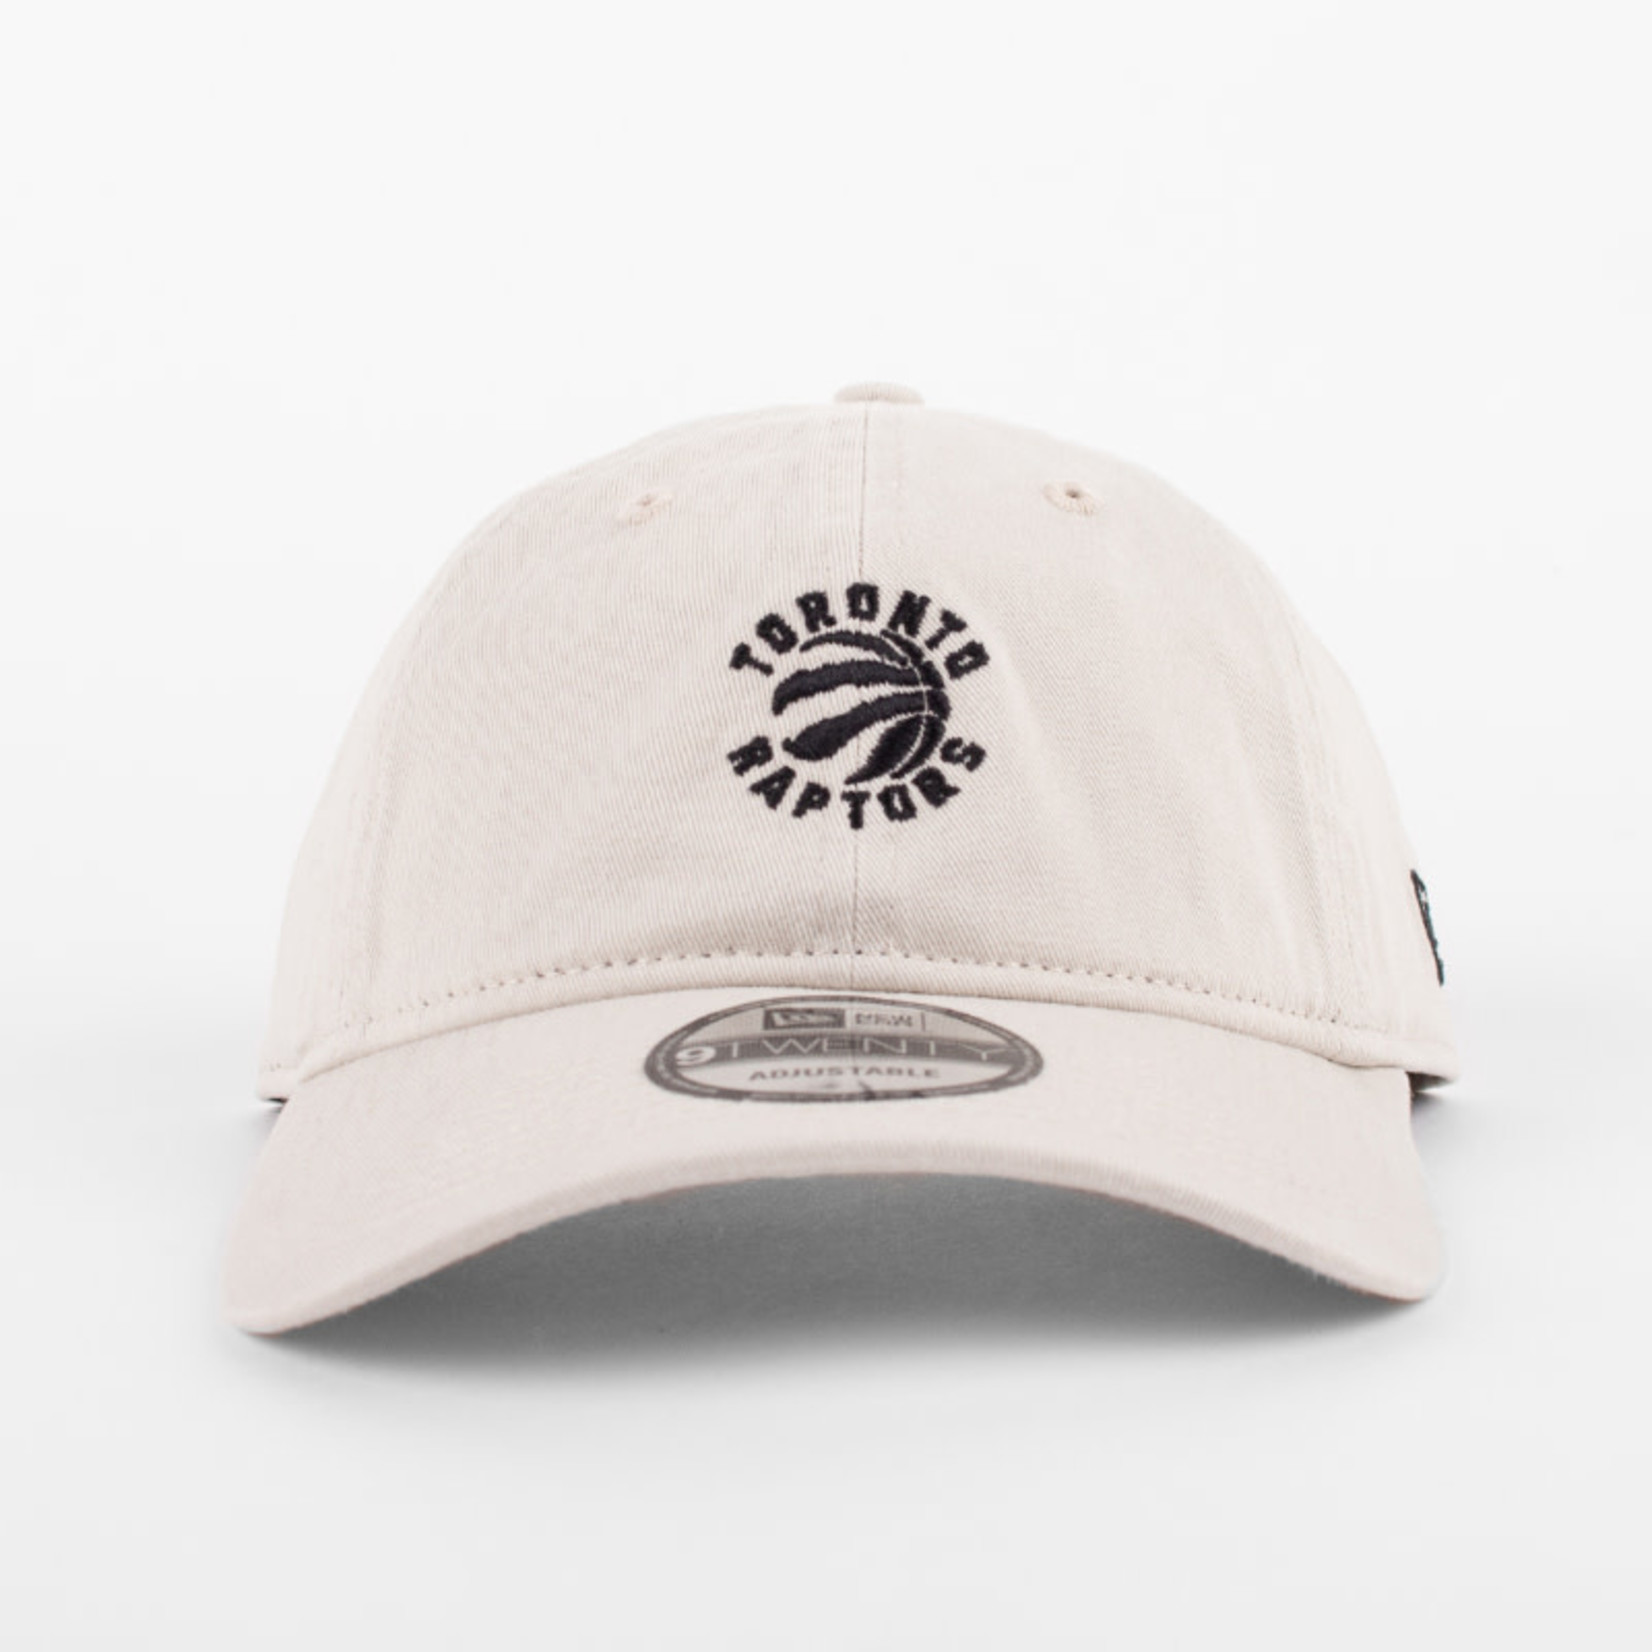 New Era New Era : 920 Toronto Raptors Black Logo Cap